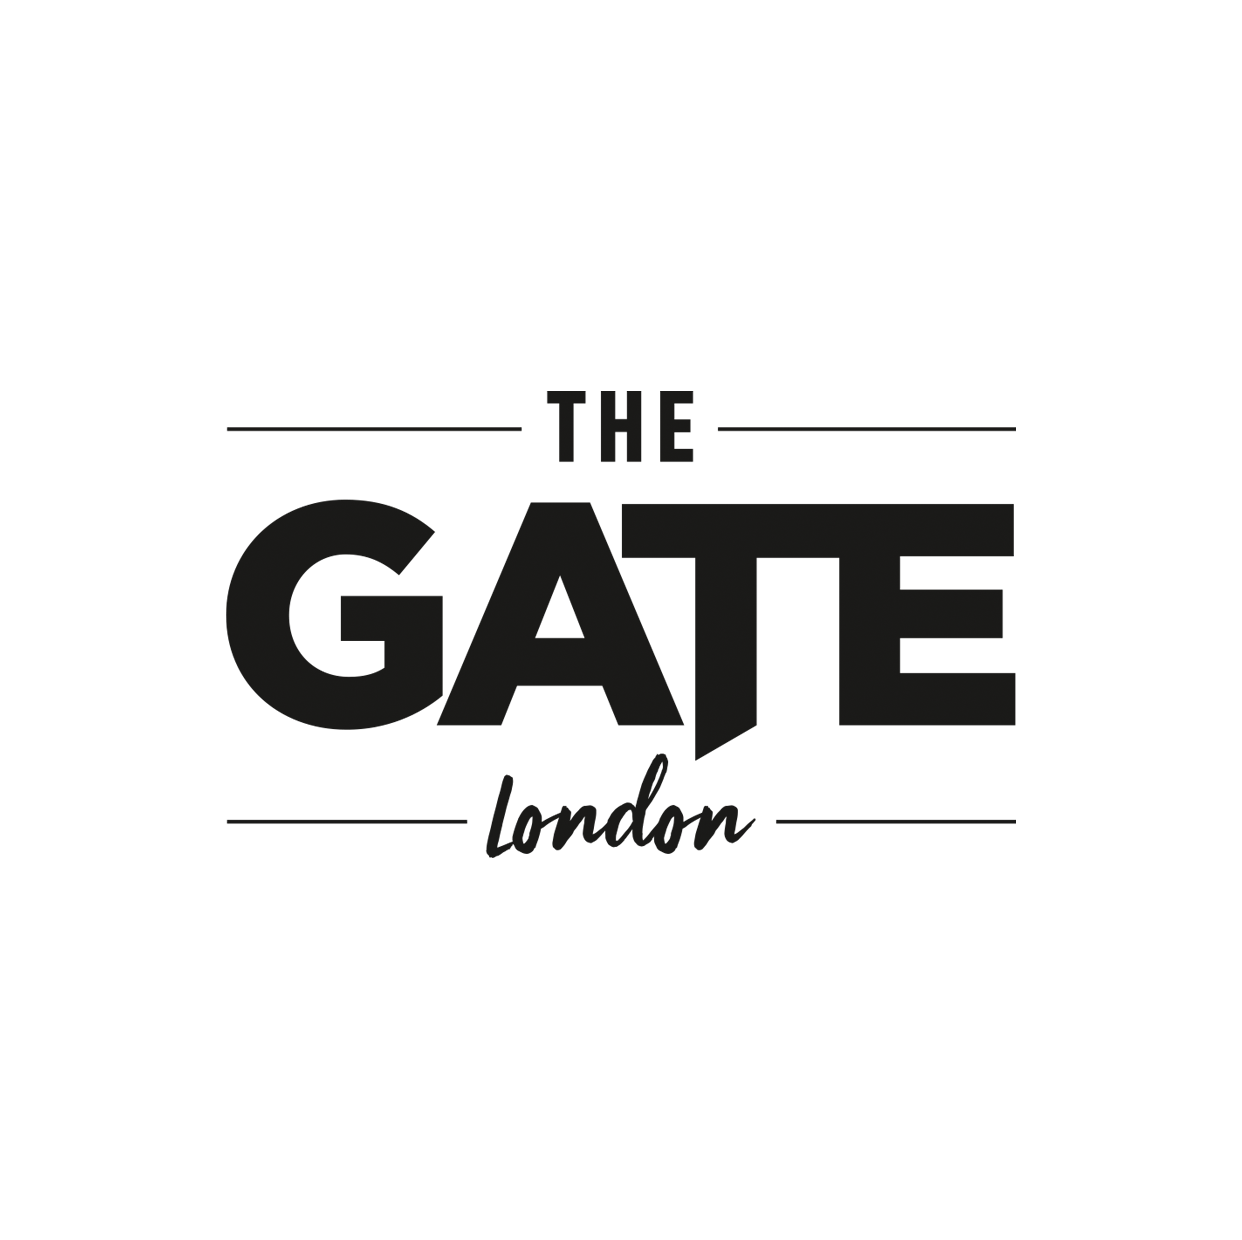 TheGateLondon_interim logo_Bk.png